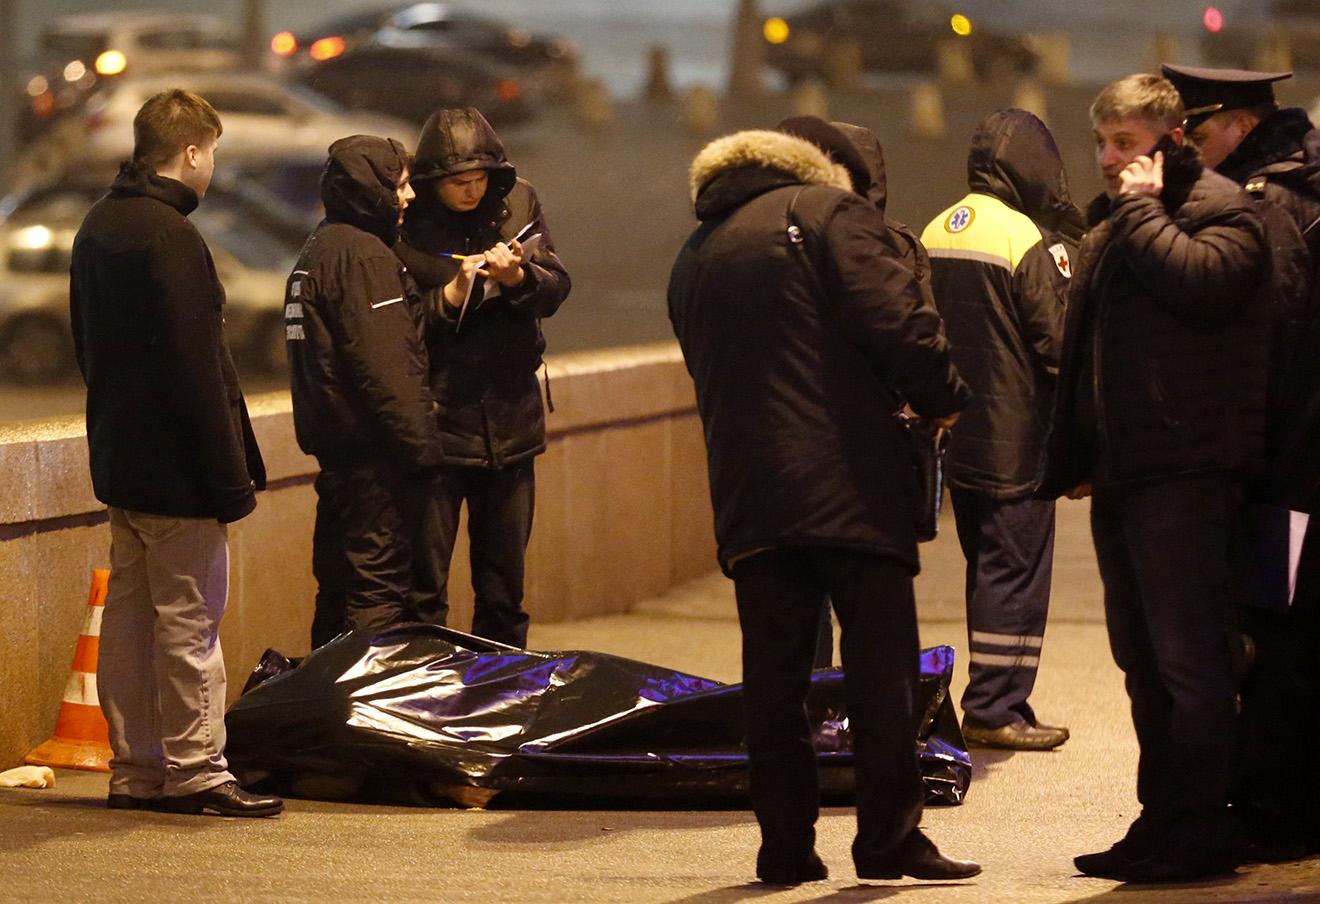 На месте убийства Бориса Немцова. 28 февраля 2016. Фото: Михаил Джапаридзе / ТАСС